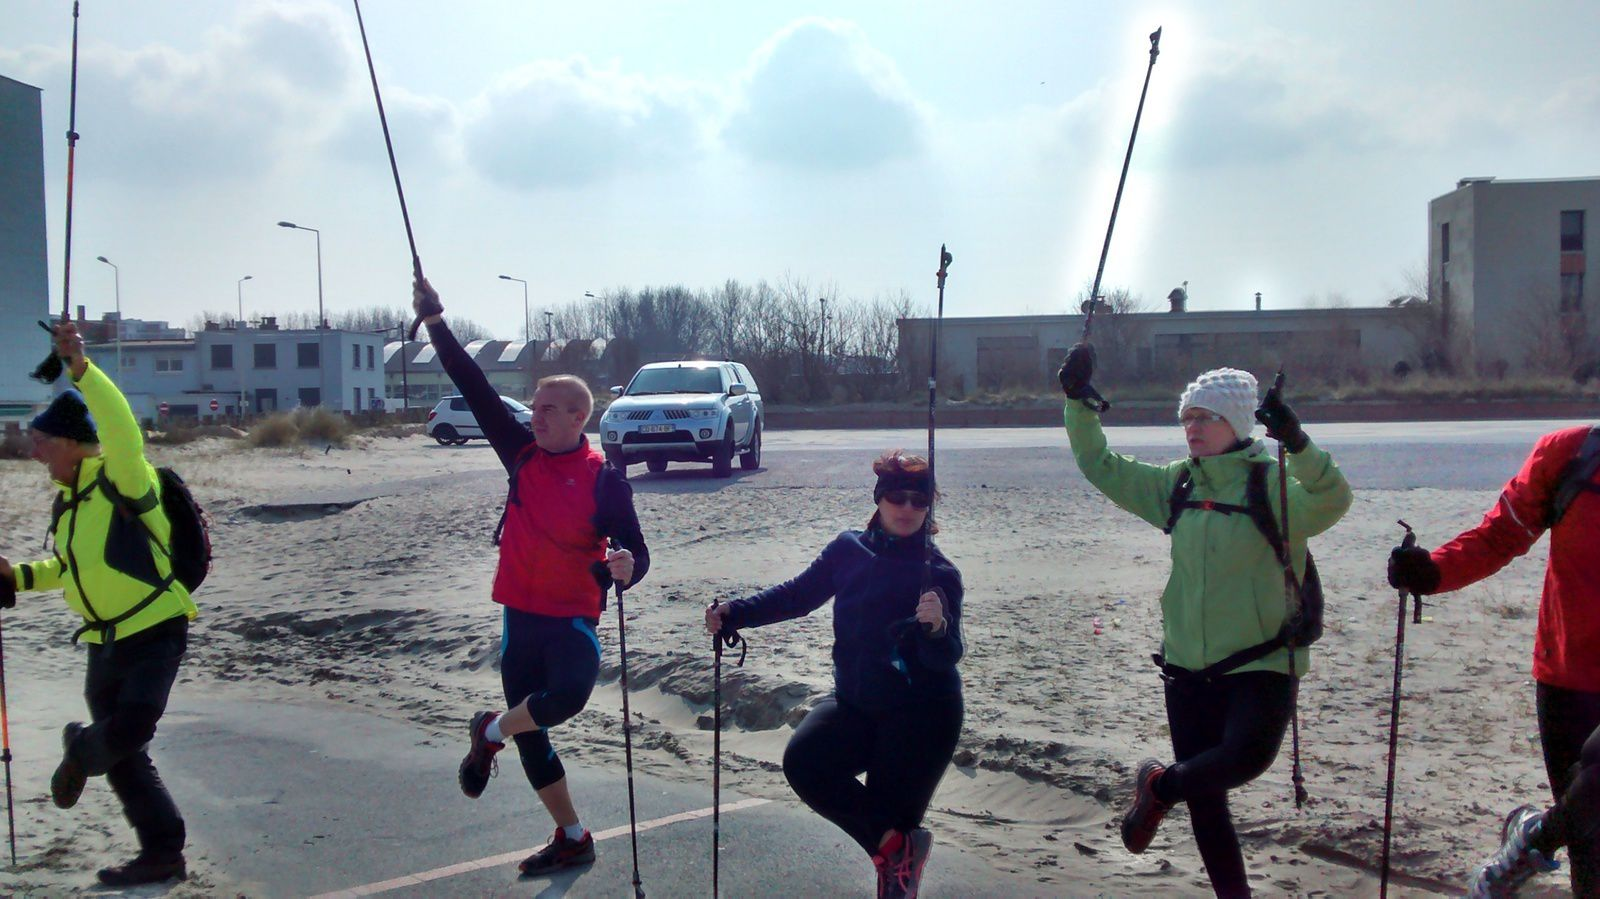 Séance du samedi 14 mars plage de Malo